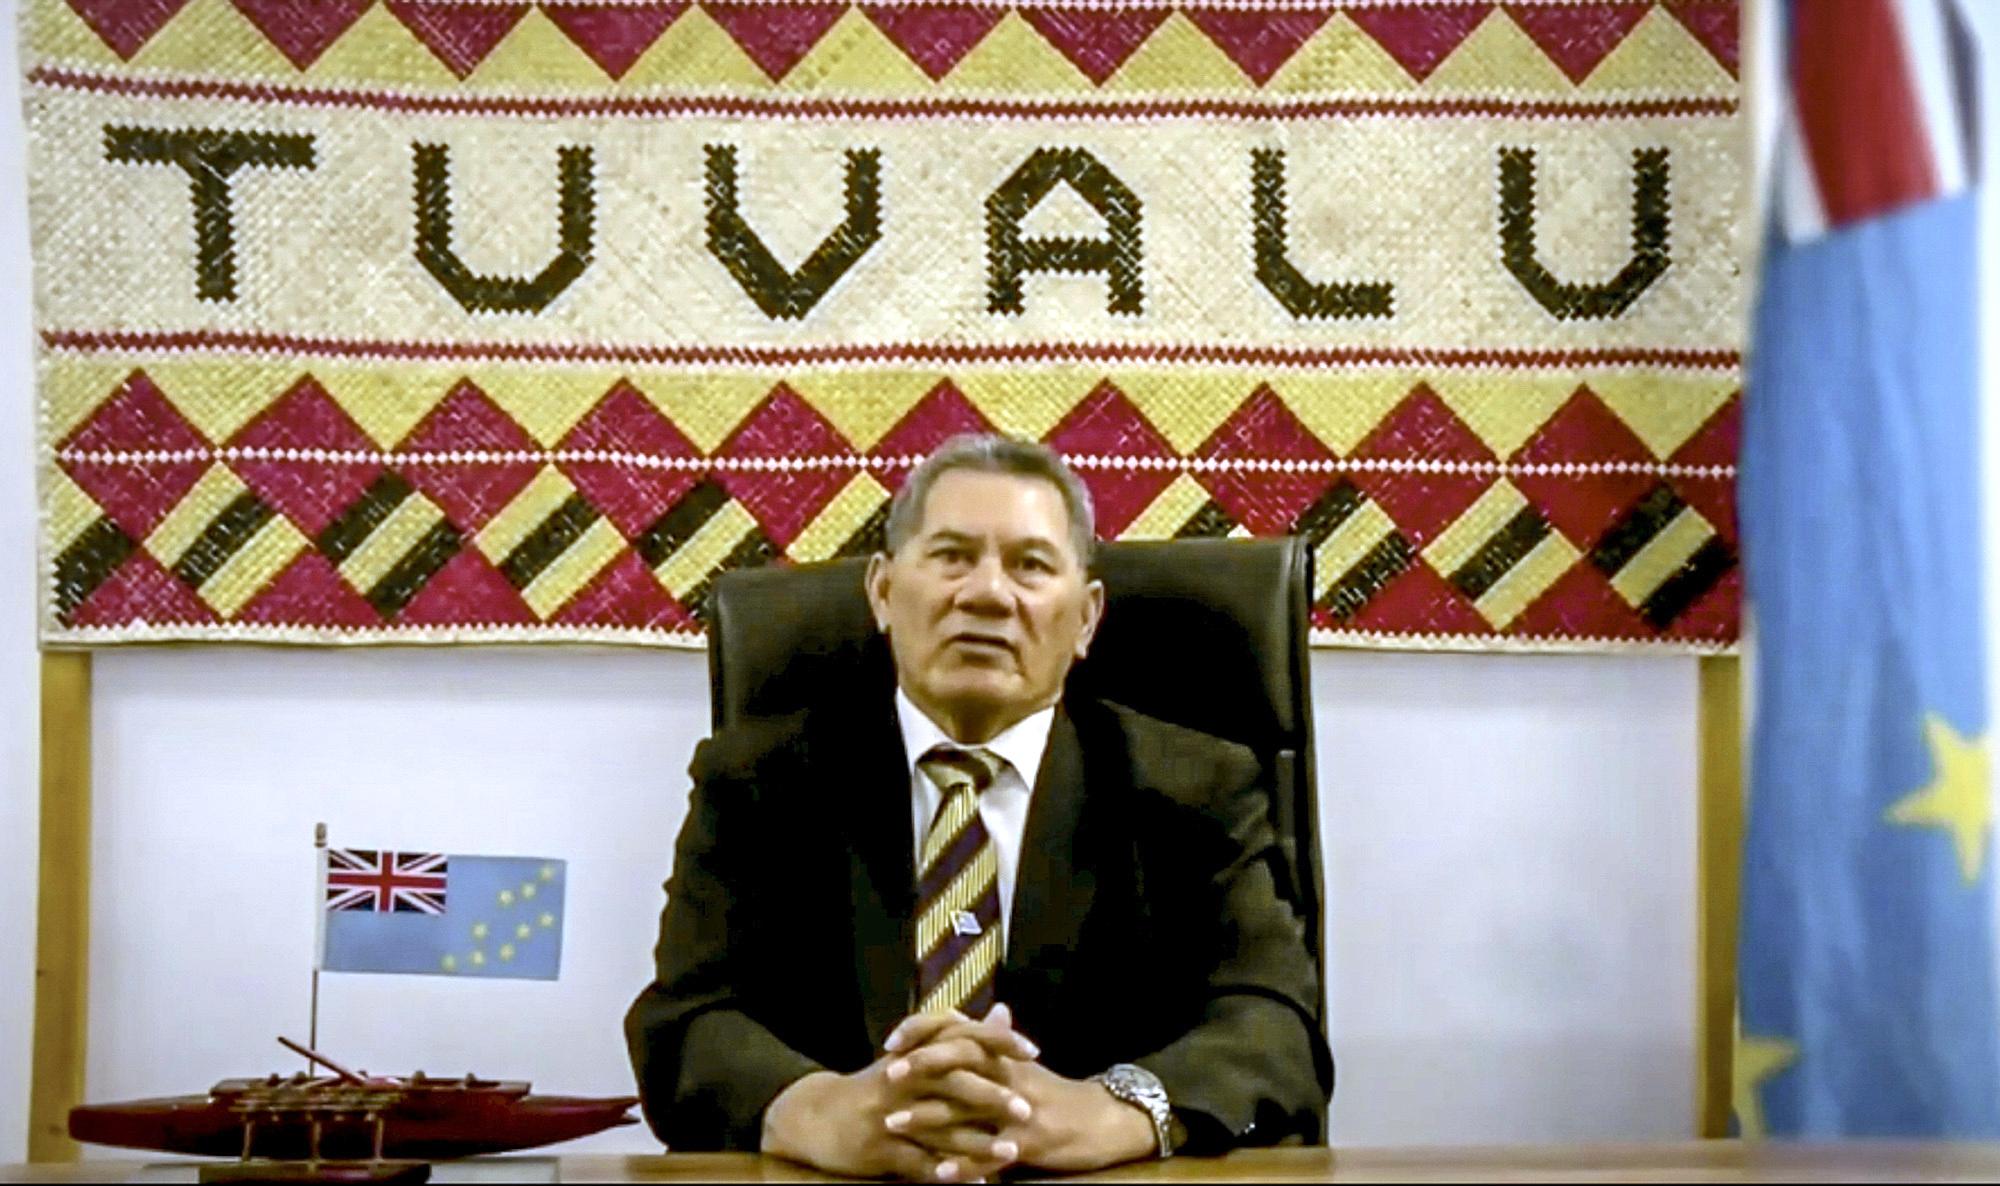 Kausea Natano, Prime Minister of Tuvalu